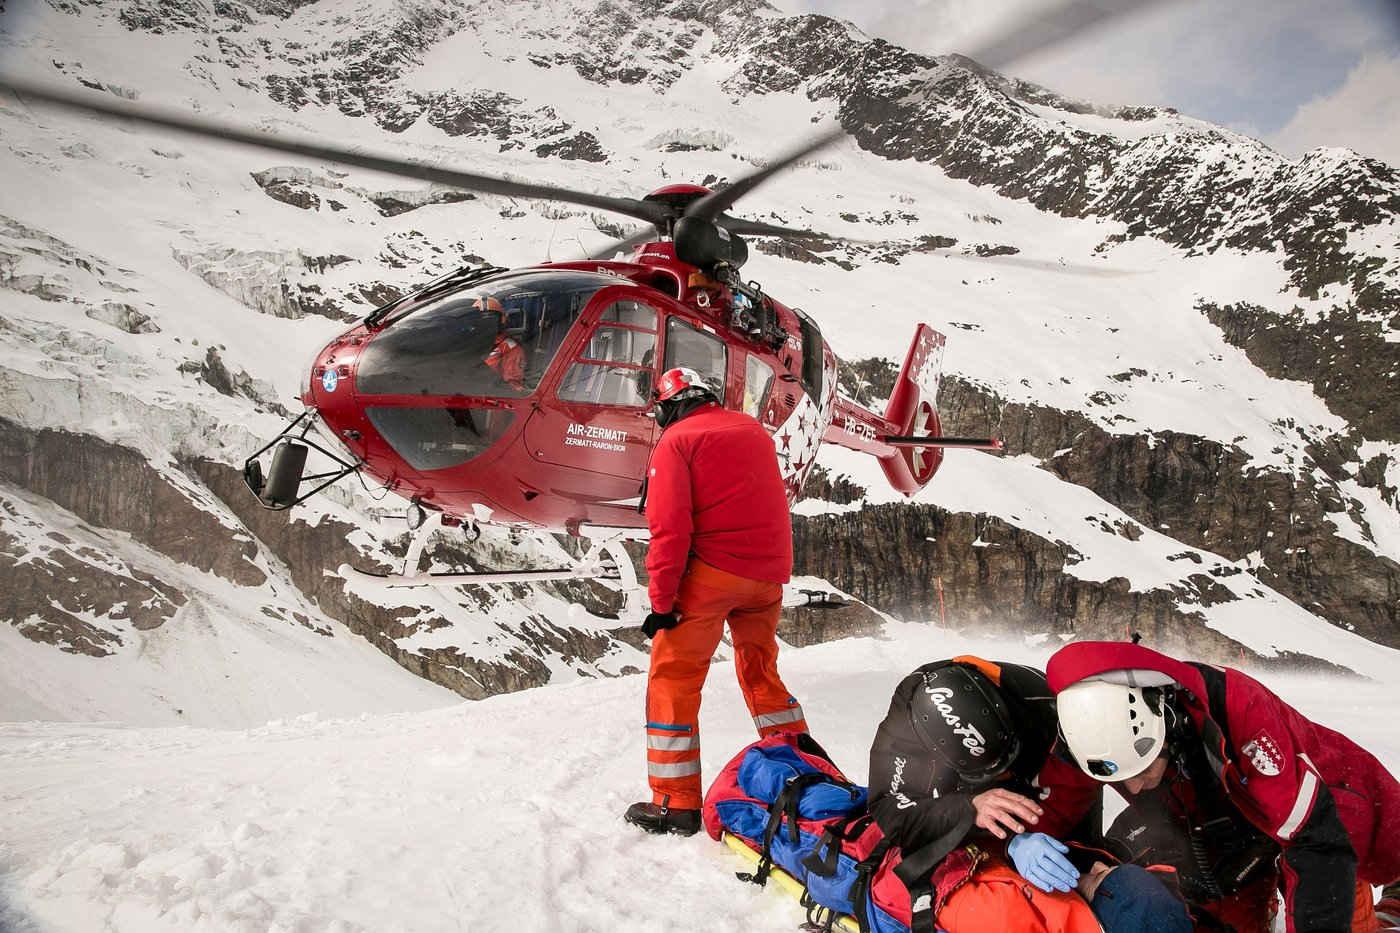 patient-awaits-pick-up-by-air-zermatt-heli.JPG